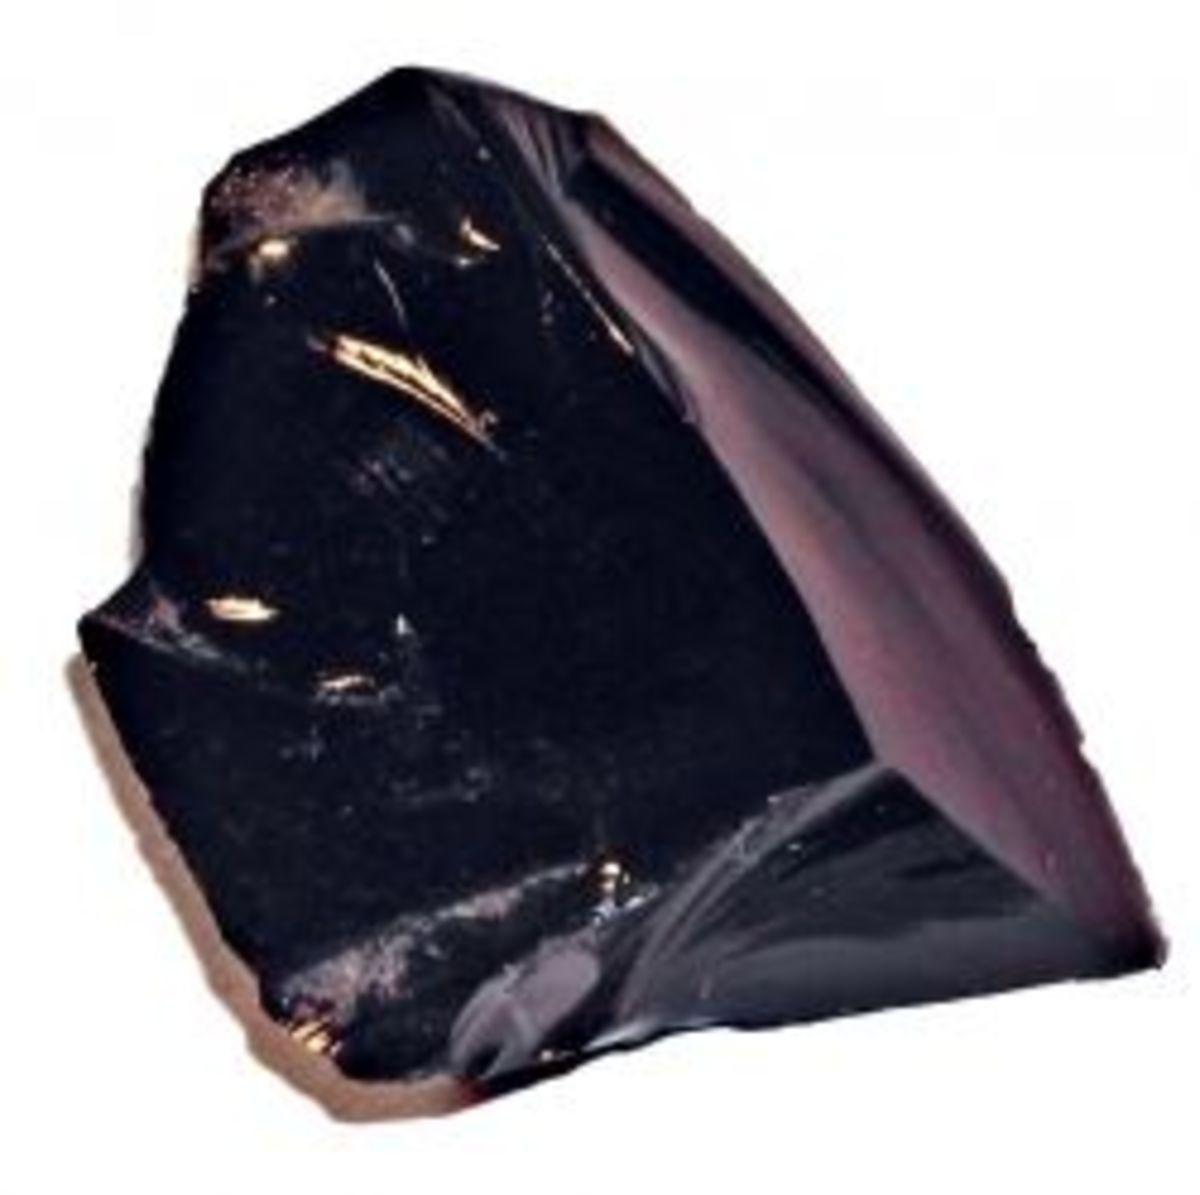 Public Domain Image, via WikiMedia Commons Obsidian_Core_Flintknapping